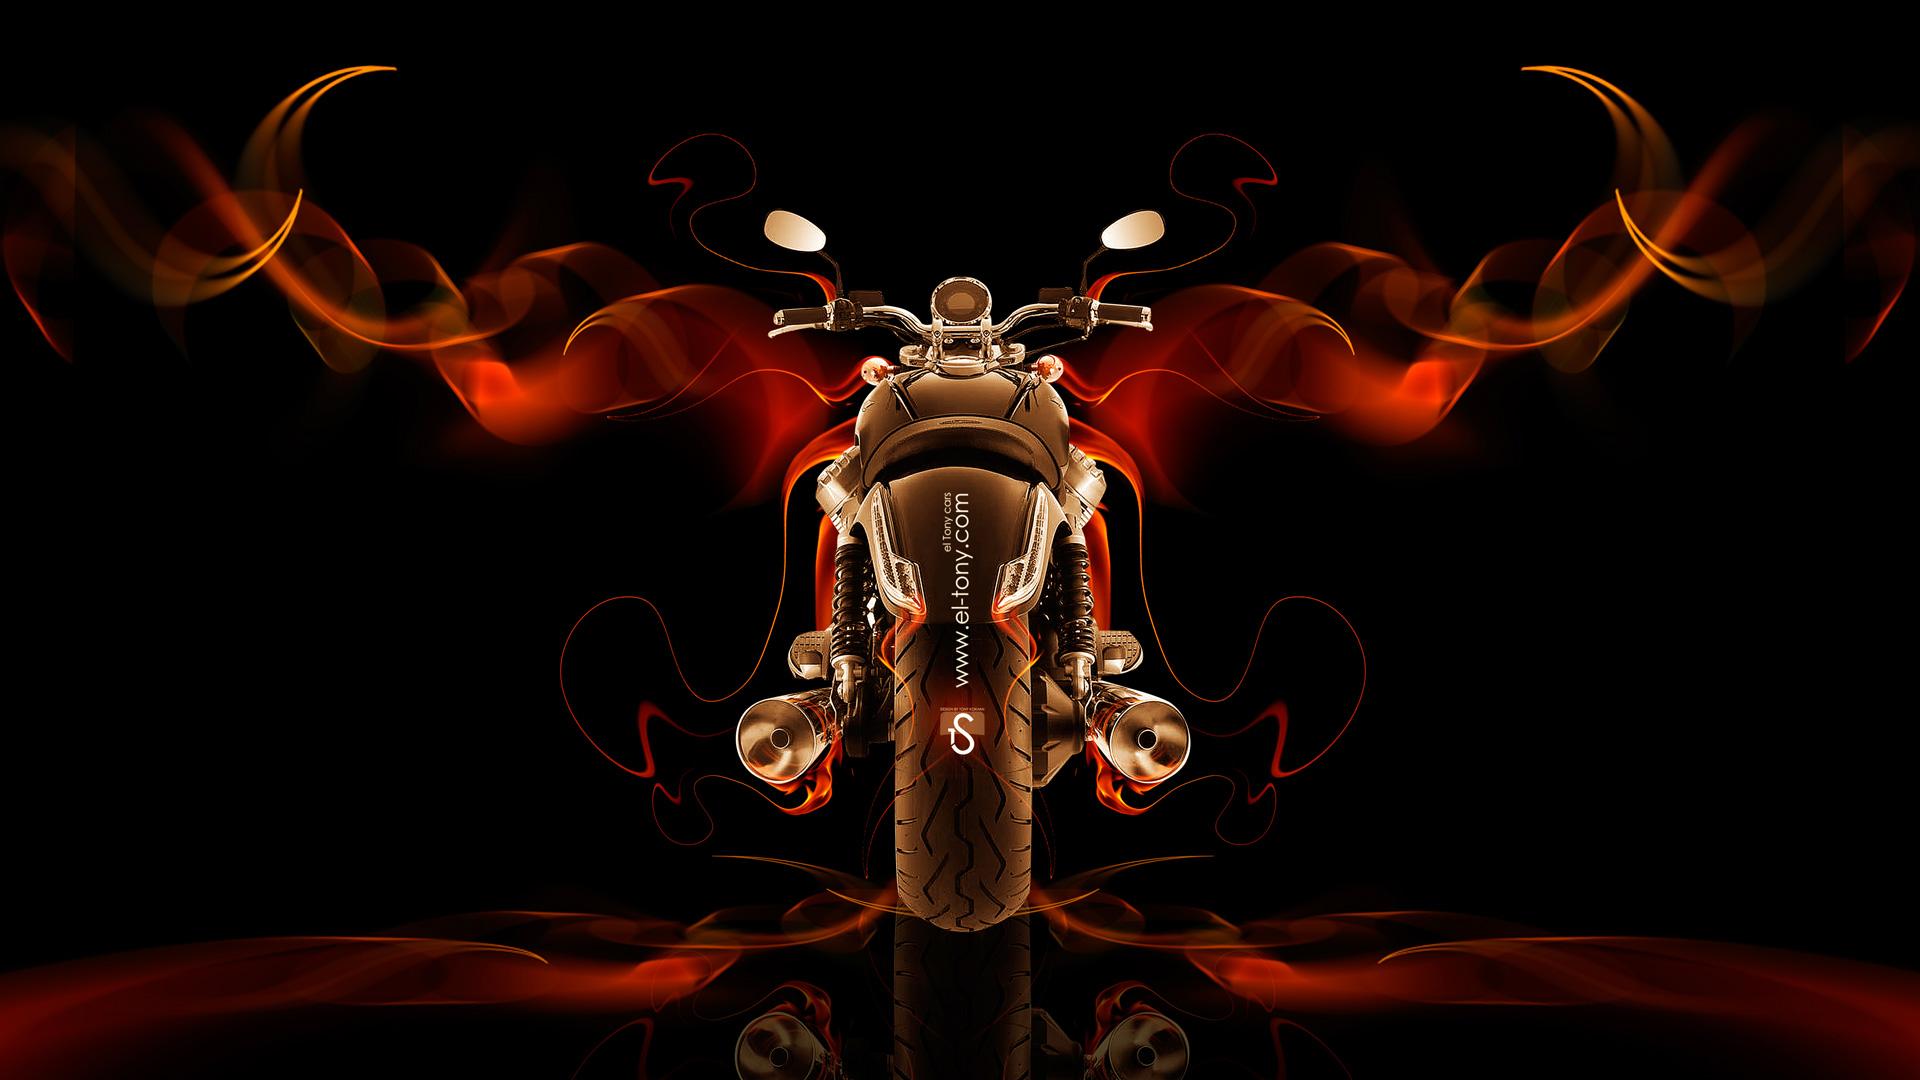 Moto Guzzi California Back Fire Abstract Bike 2014 HD Wallpapers ...